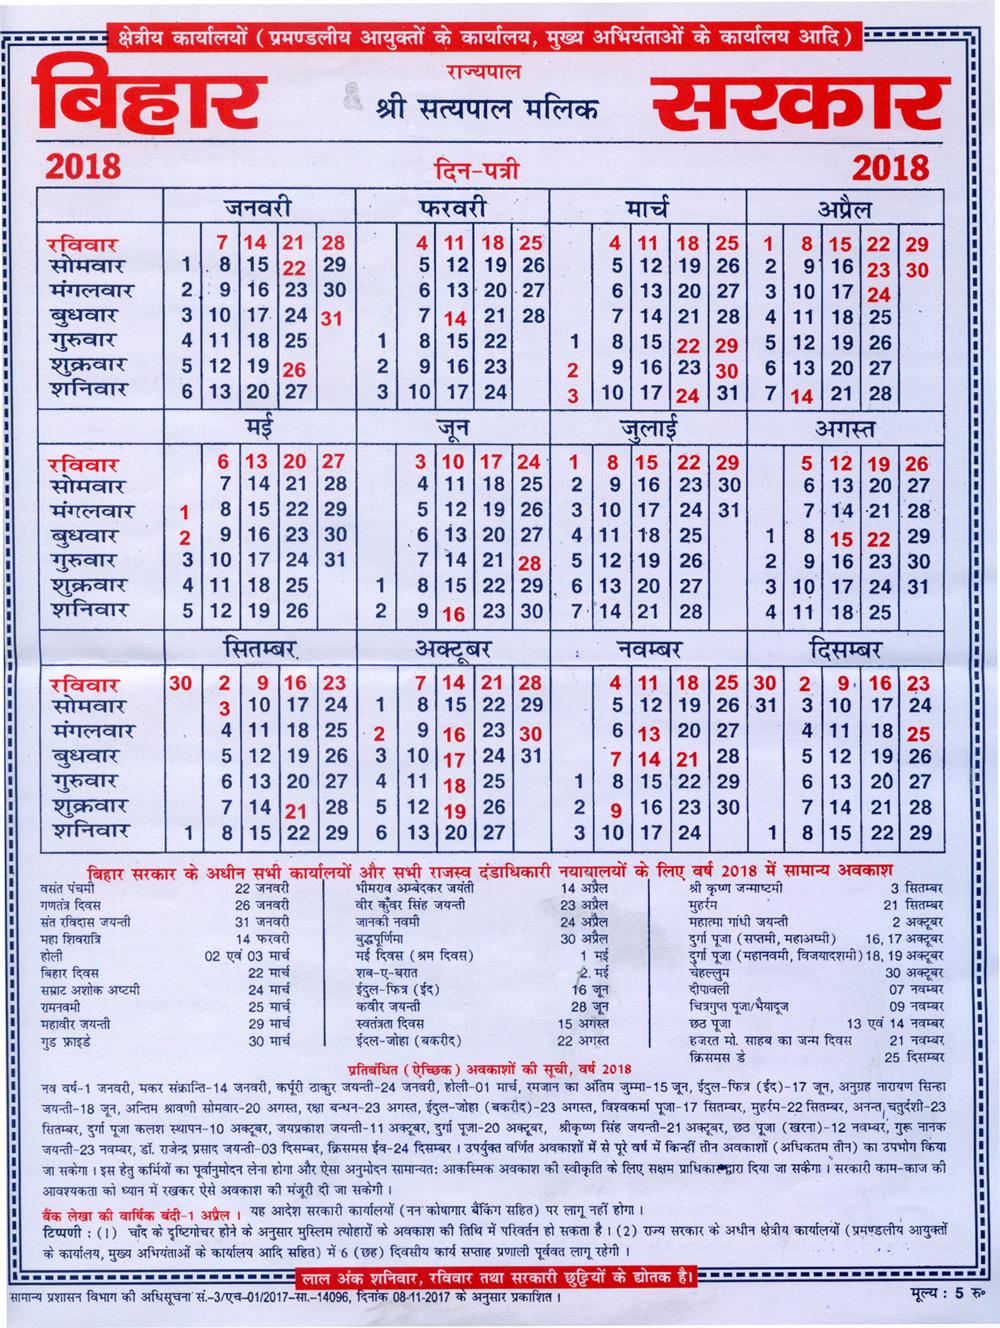 Bihar Govt. Calendar 2018, Bihar Govt. Holiday List, Holiday inside Government Calendar 2020 Bihar